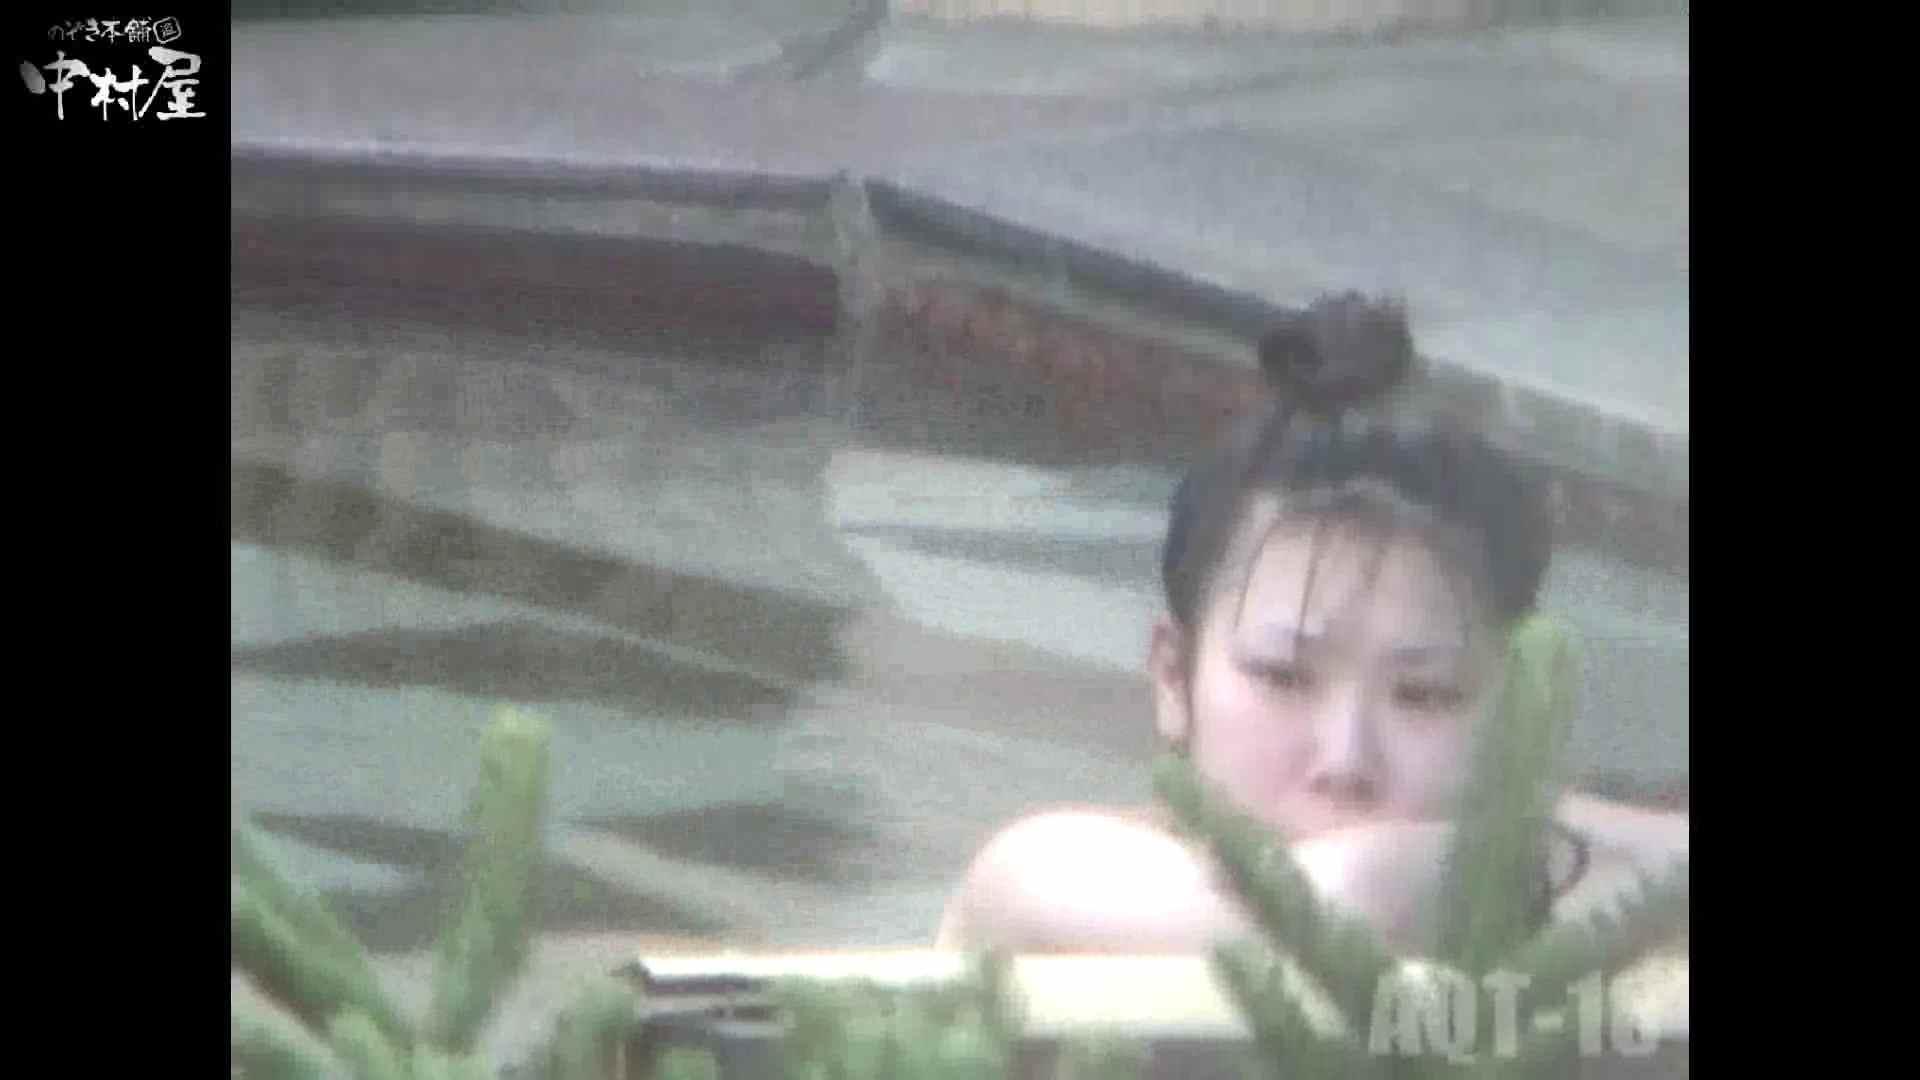 Aquaな露天風呂Vol.882潜入盗撮露天風呂十八判湯 其の二 盗撮 性交動画流出 90画像 90